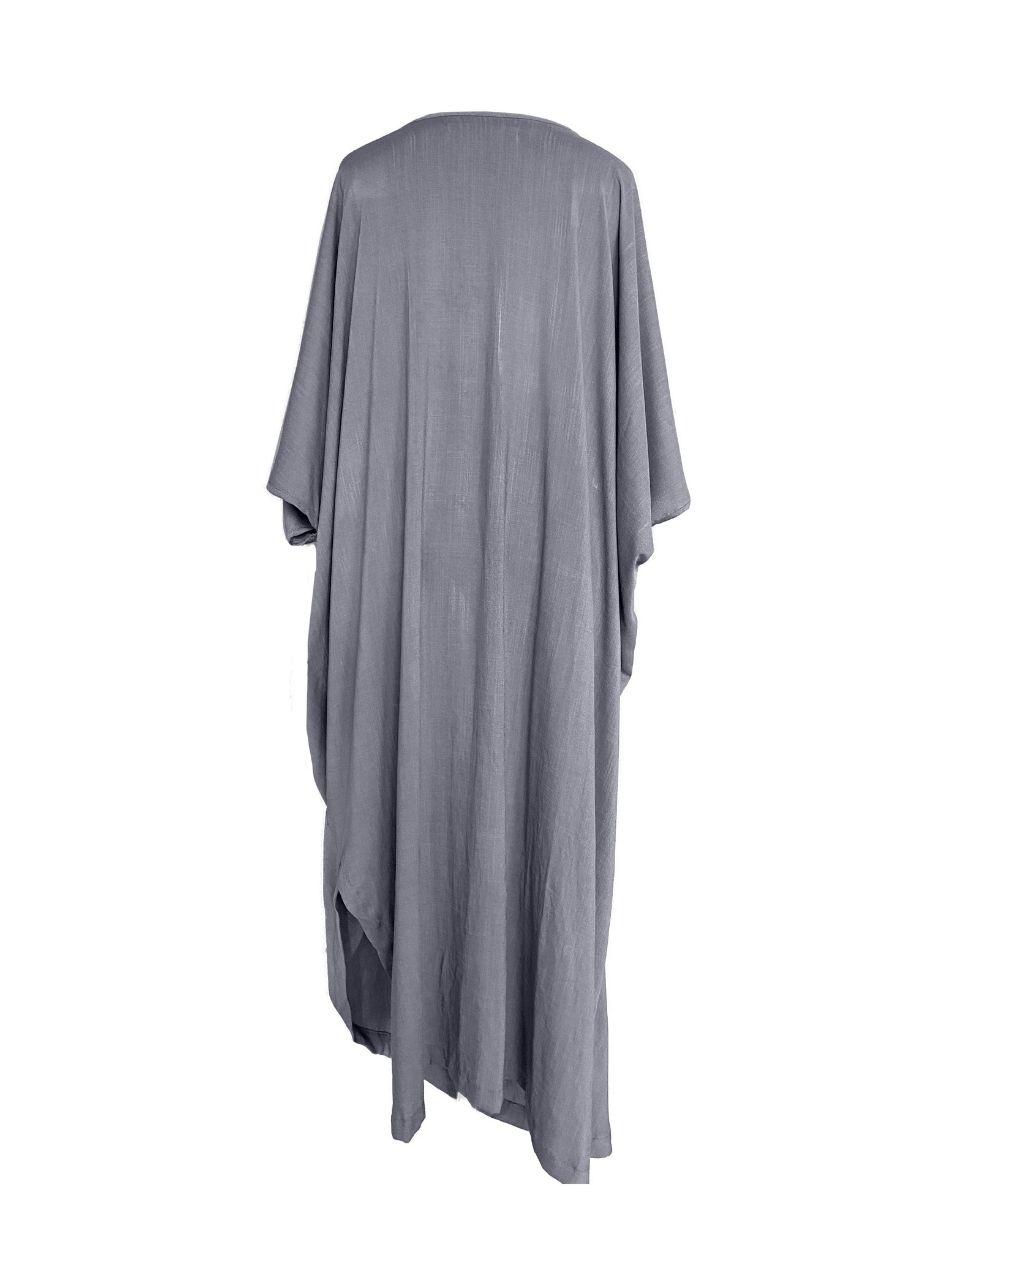 Vestido Detalhe Interno Viscose